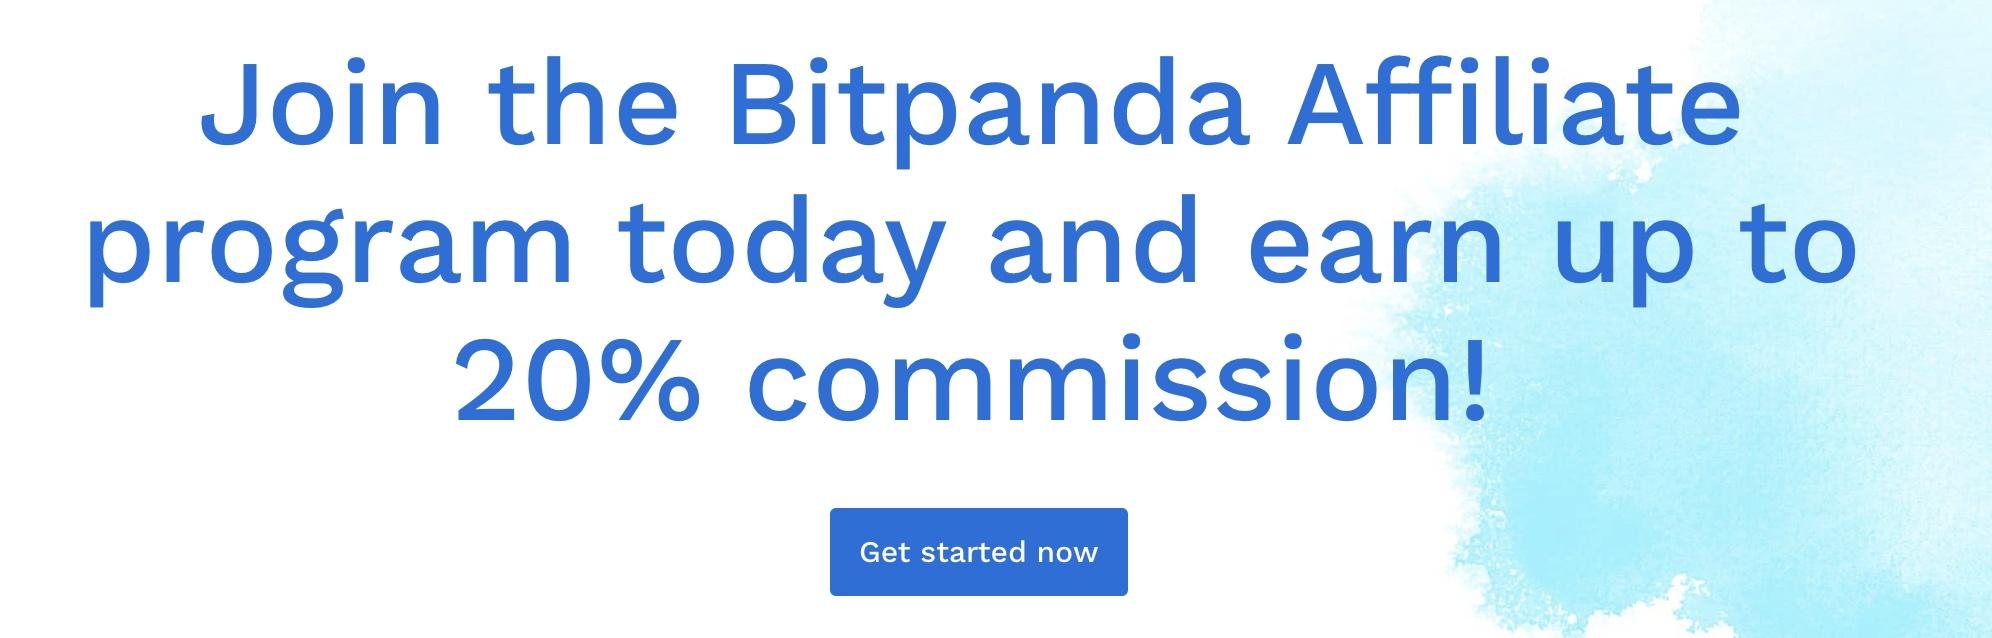 bitpanda affiliate program